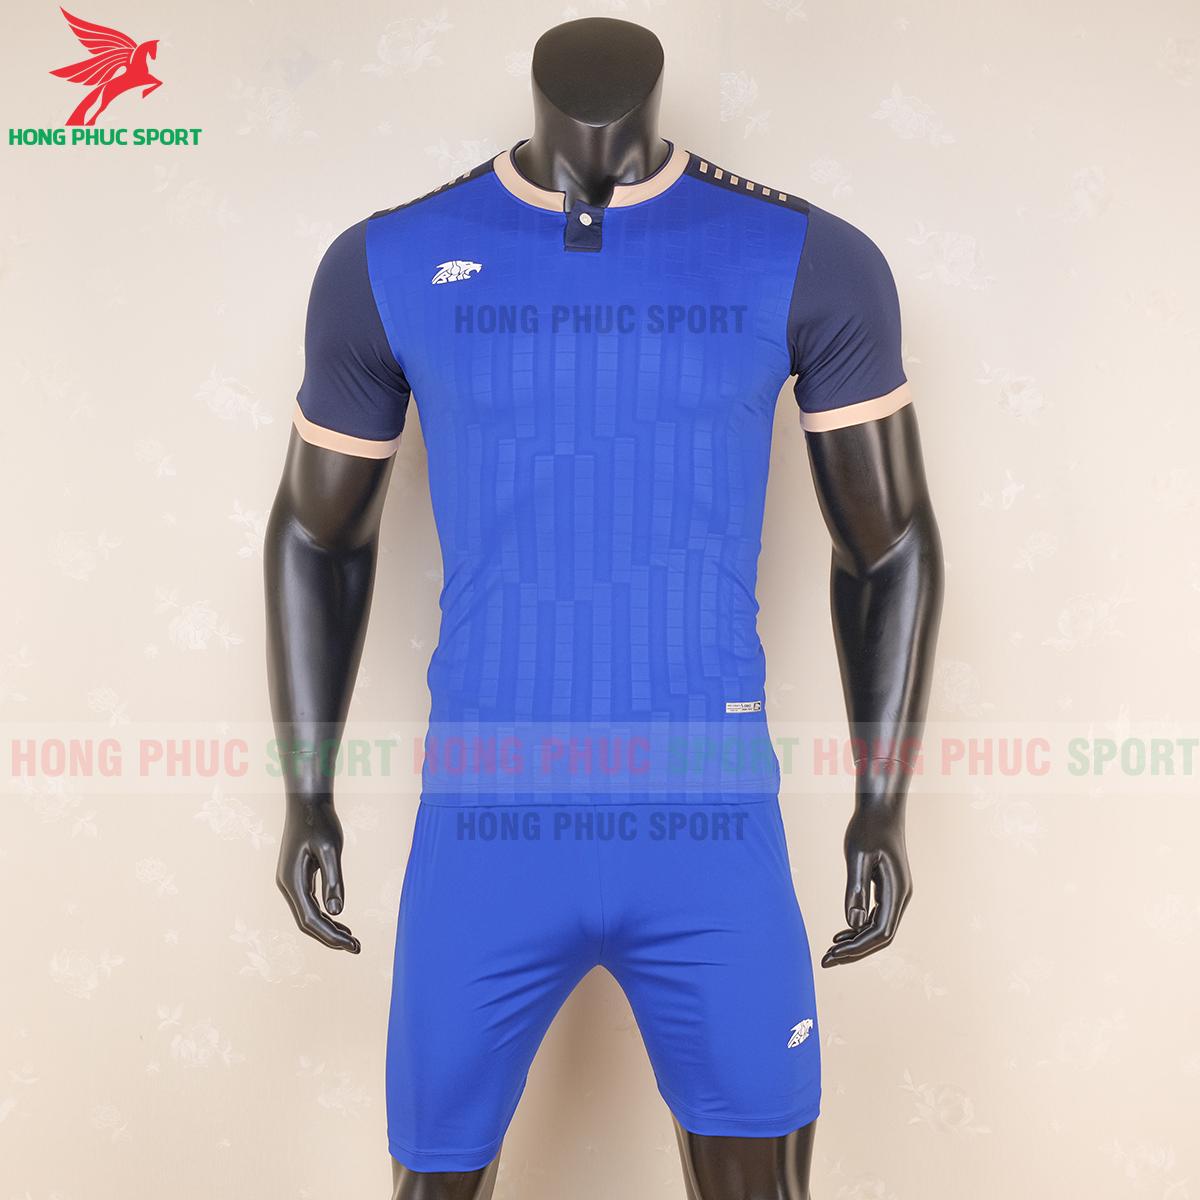 https://cdn.hongphucsport.com/unsafe/s4.shopbay.vn/files/285/ao-bong-da-khong-logo-riki-neck-xanh-duong-6-5f71afc83a449.png